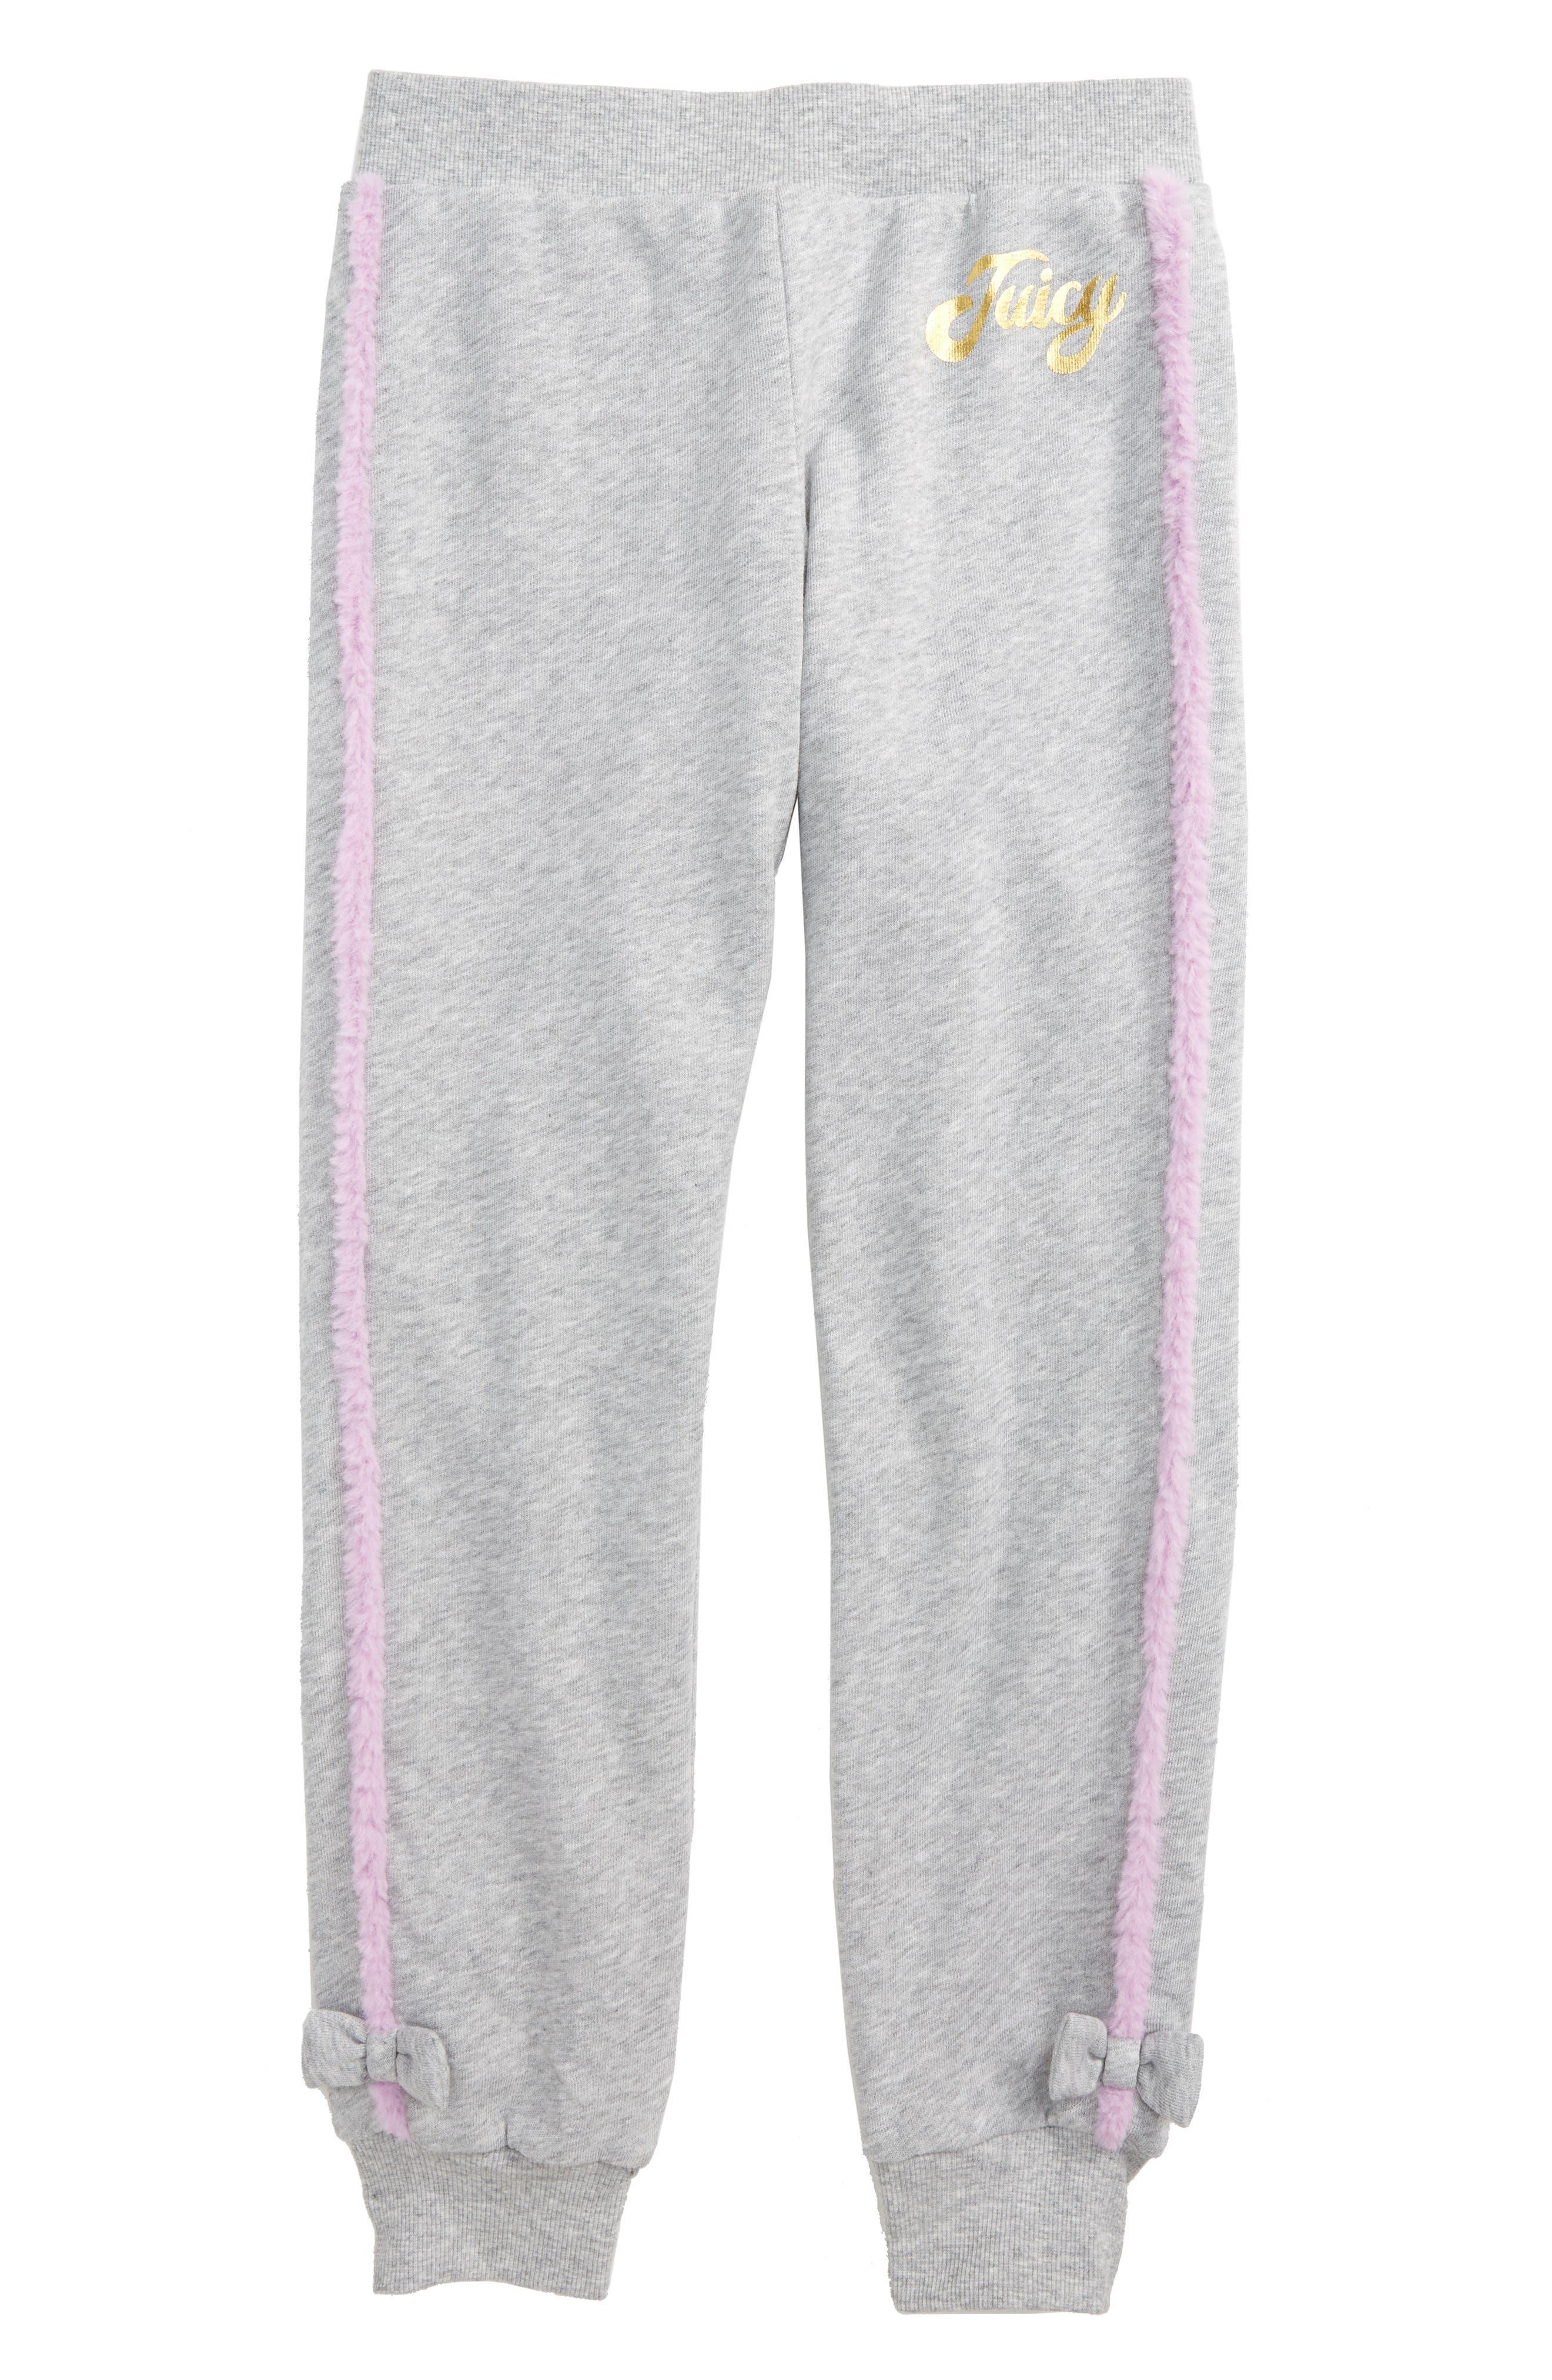 Alternate Image 1 Selected - Juicy Couture Faux Fur Trim Jogger Pants (Big Girls)